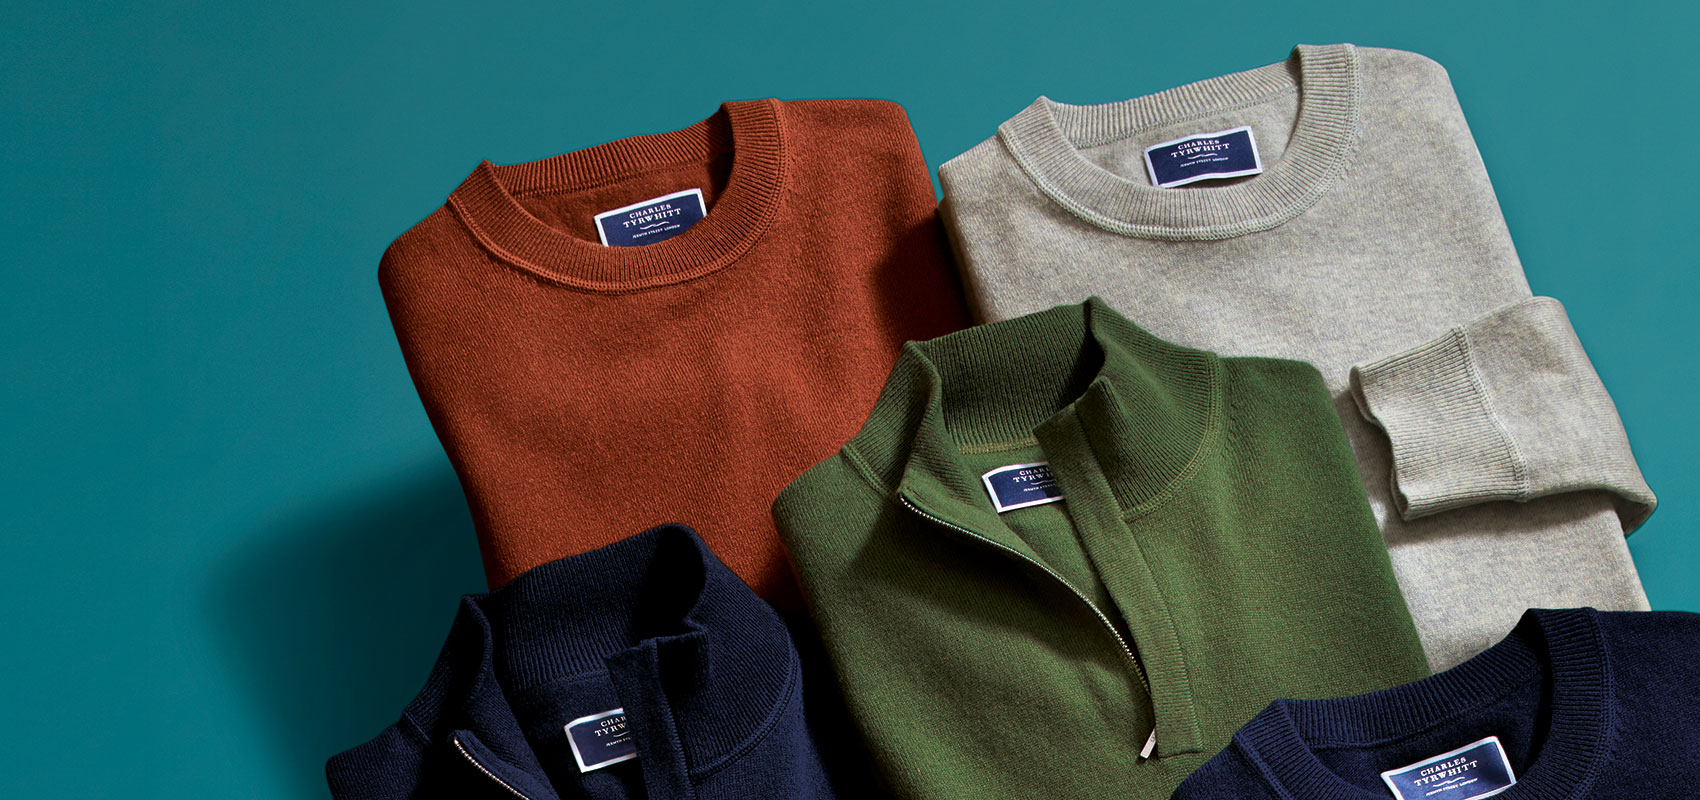 Charles Tyrwhitt Pure Cashmere Knitwear